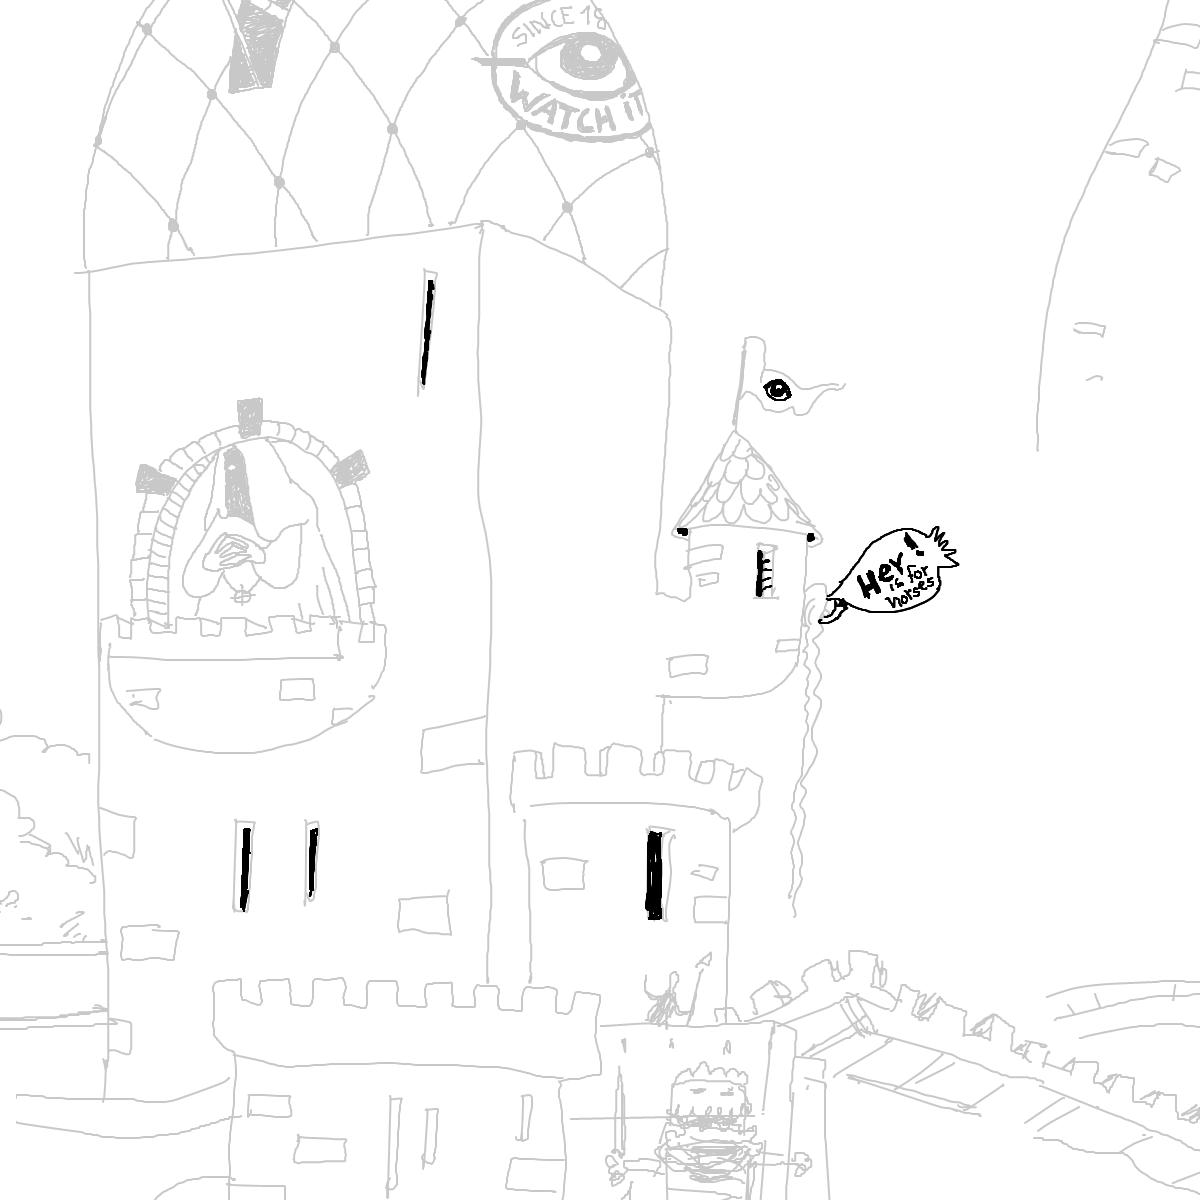 BAAAM drawing#3814 lat:78.4176025390625000lng: -4.4395389556884770